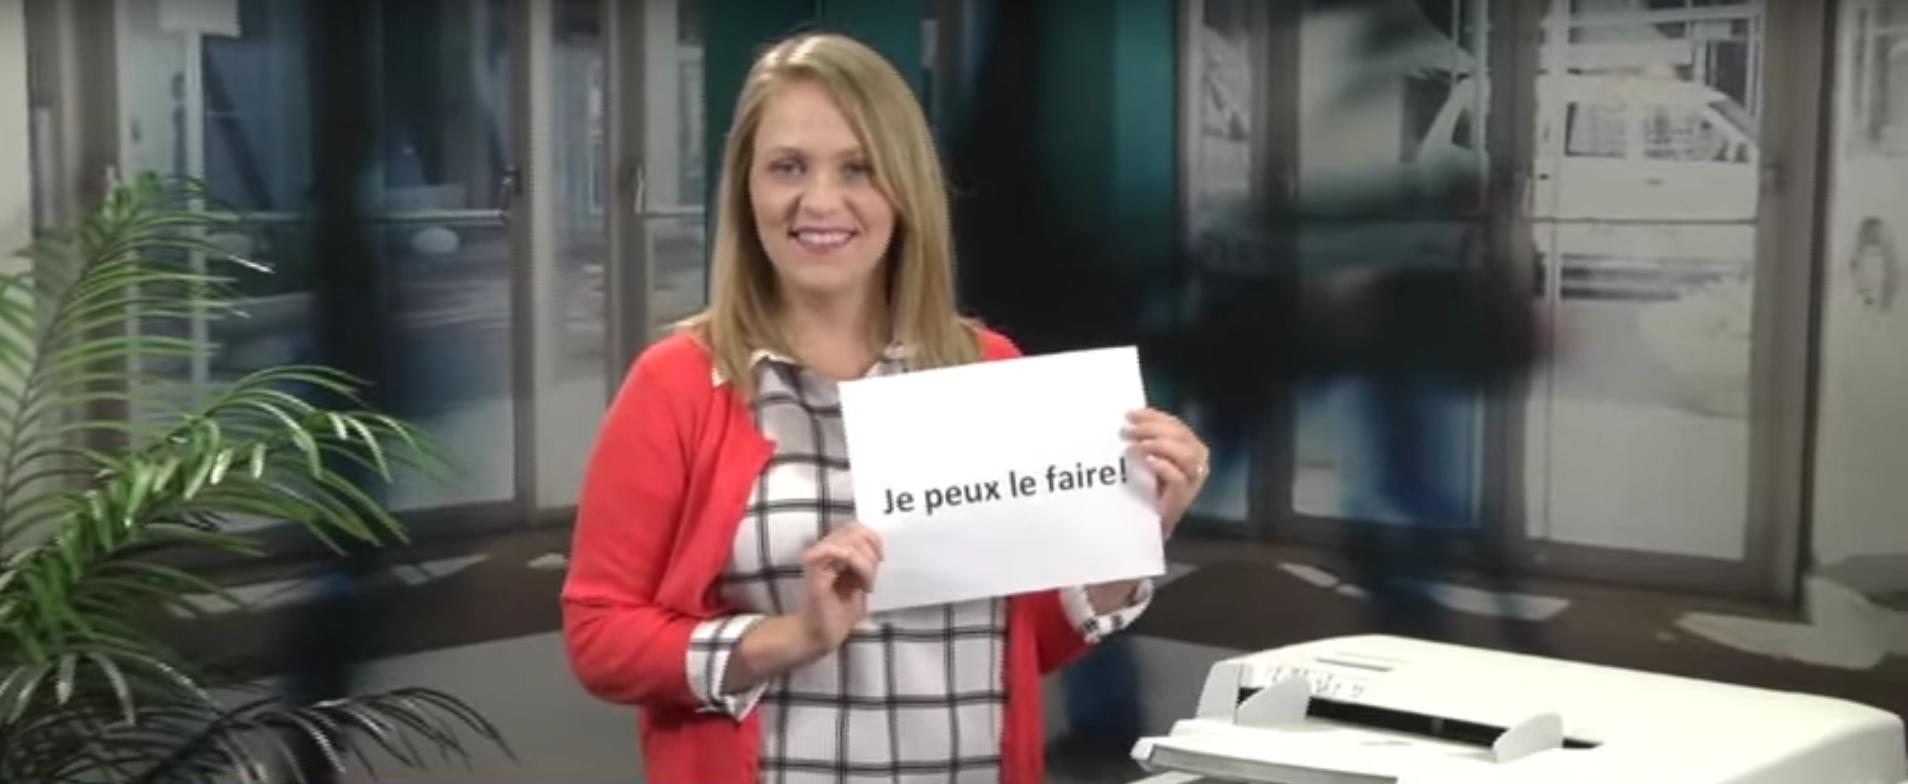 Xerox's new printers include language translation service